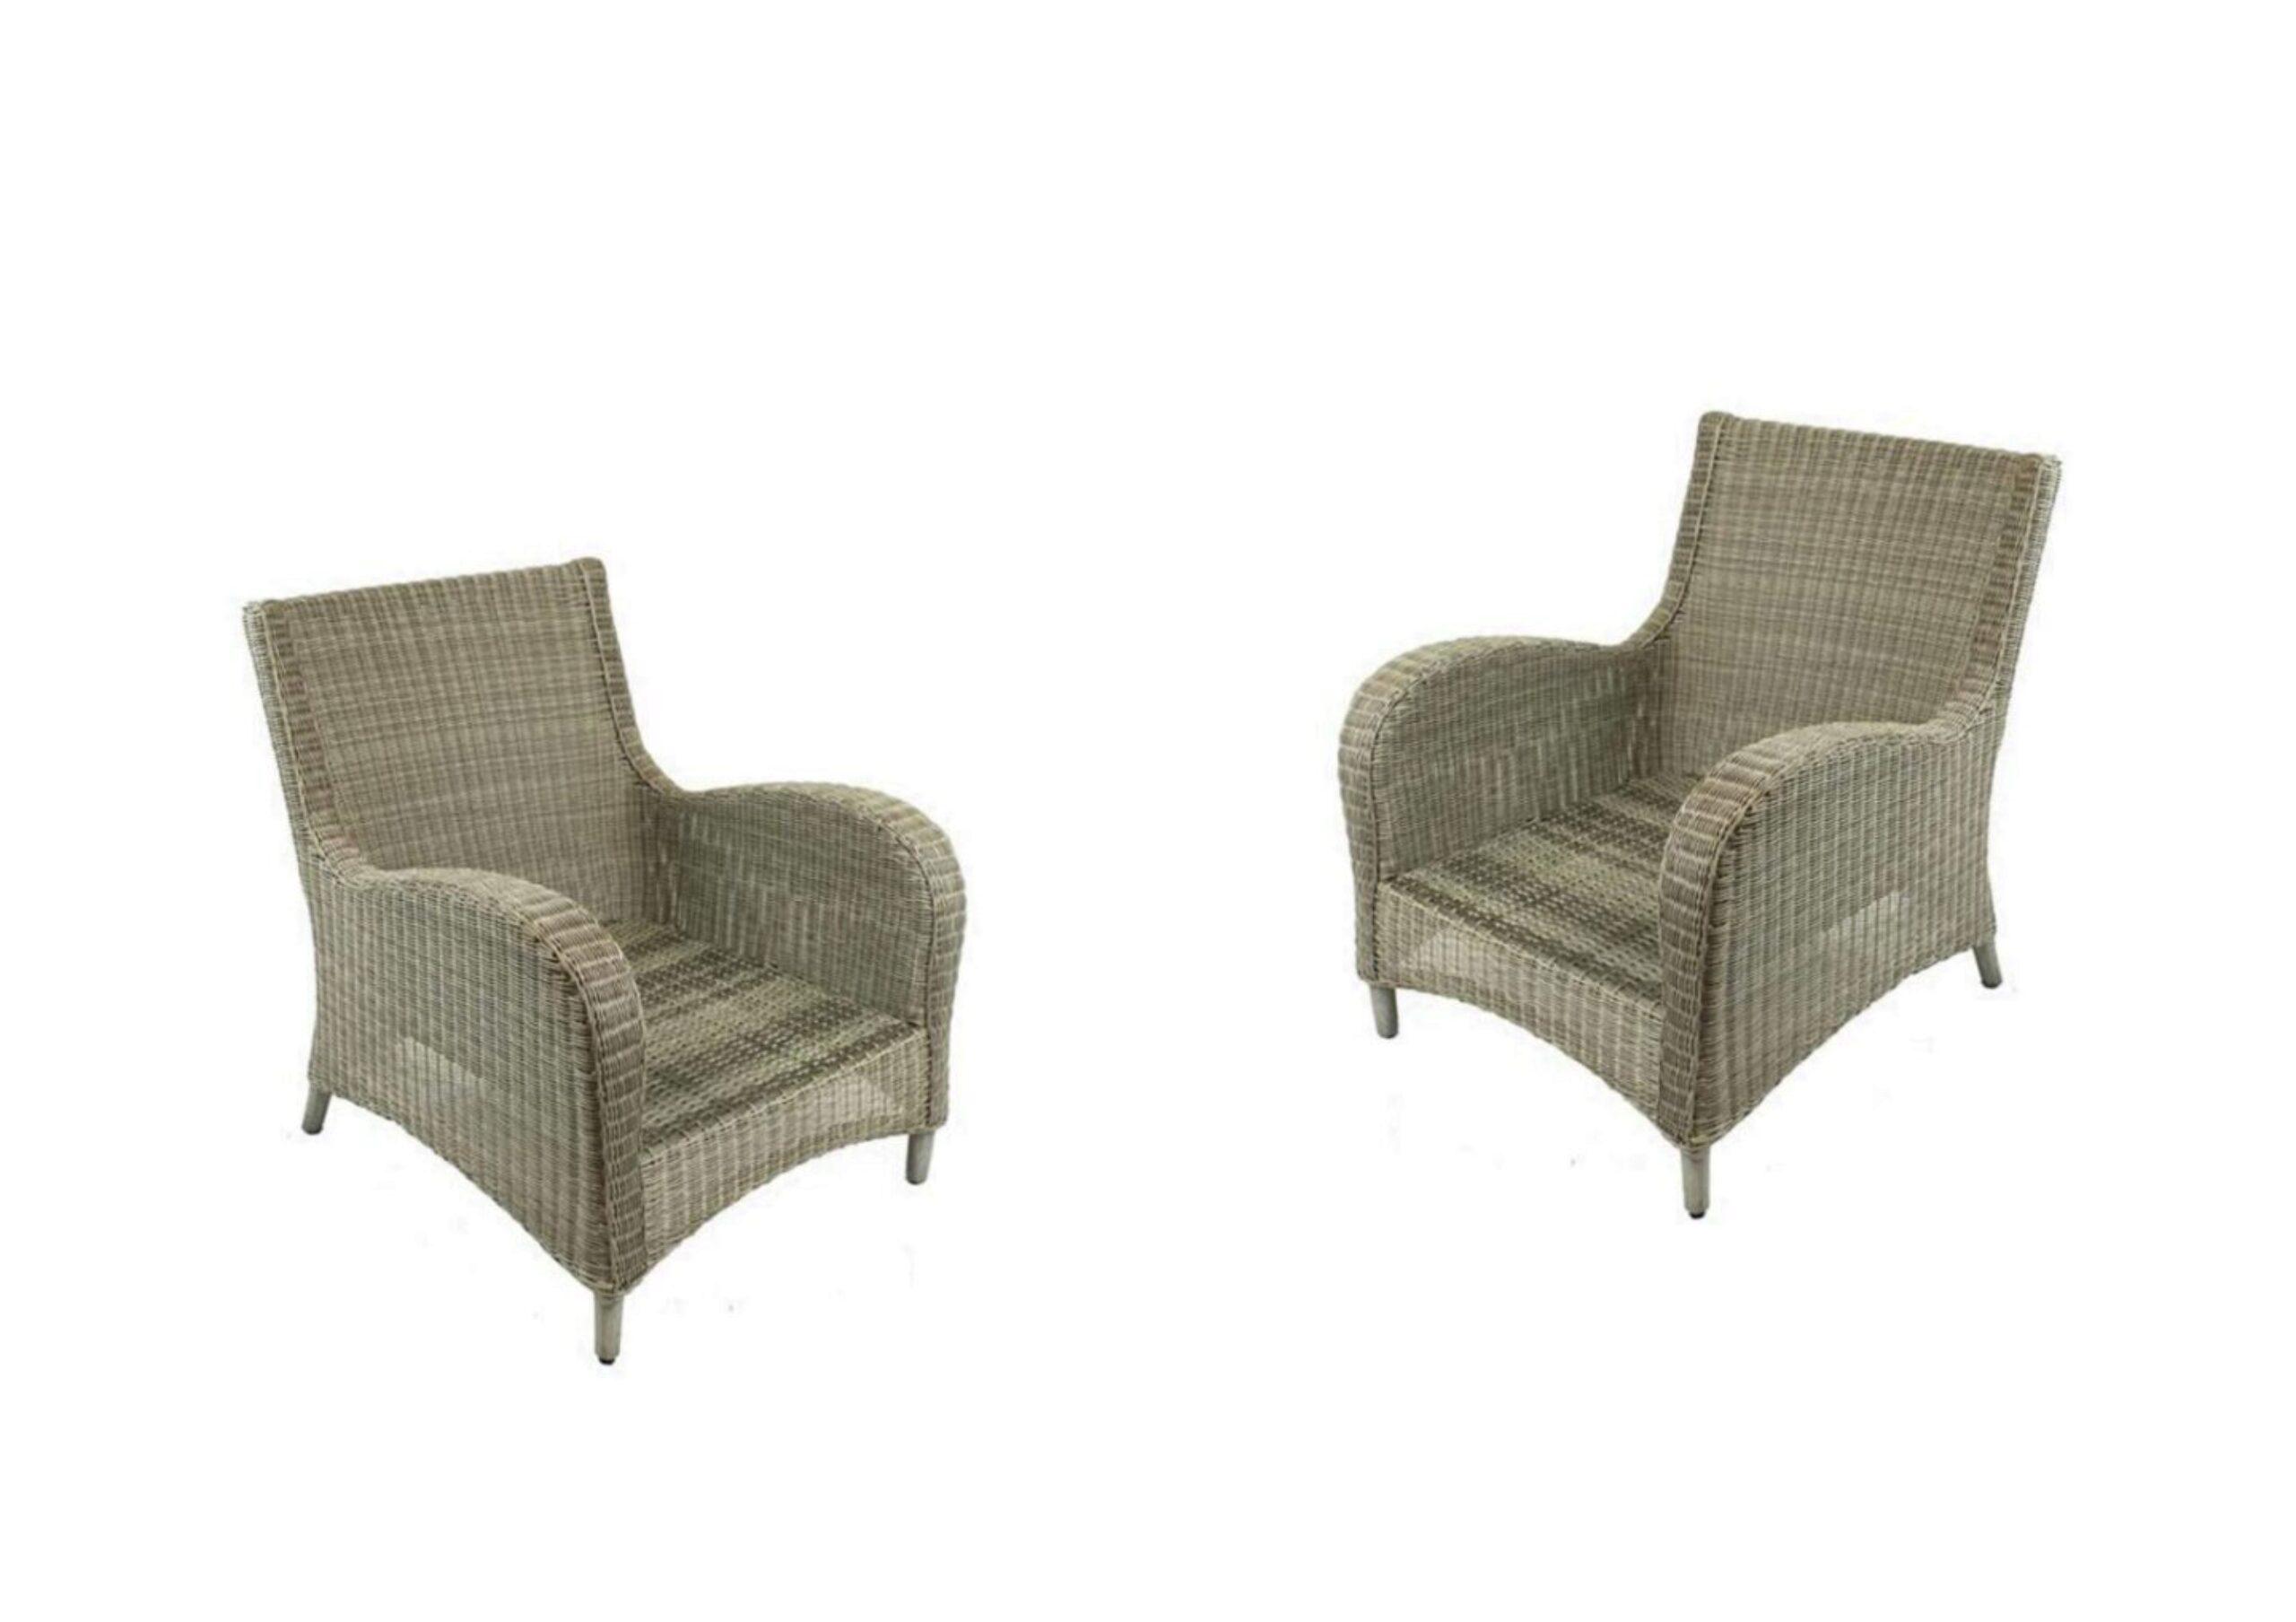 athena wicker fully welded club chair high back w sunbrella cushion set of 2 by calipatio special order